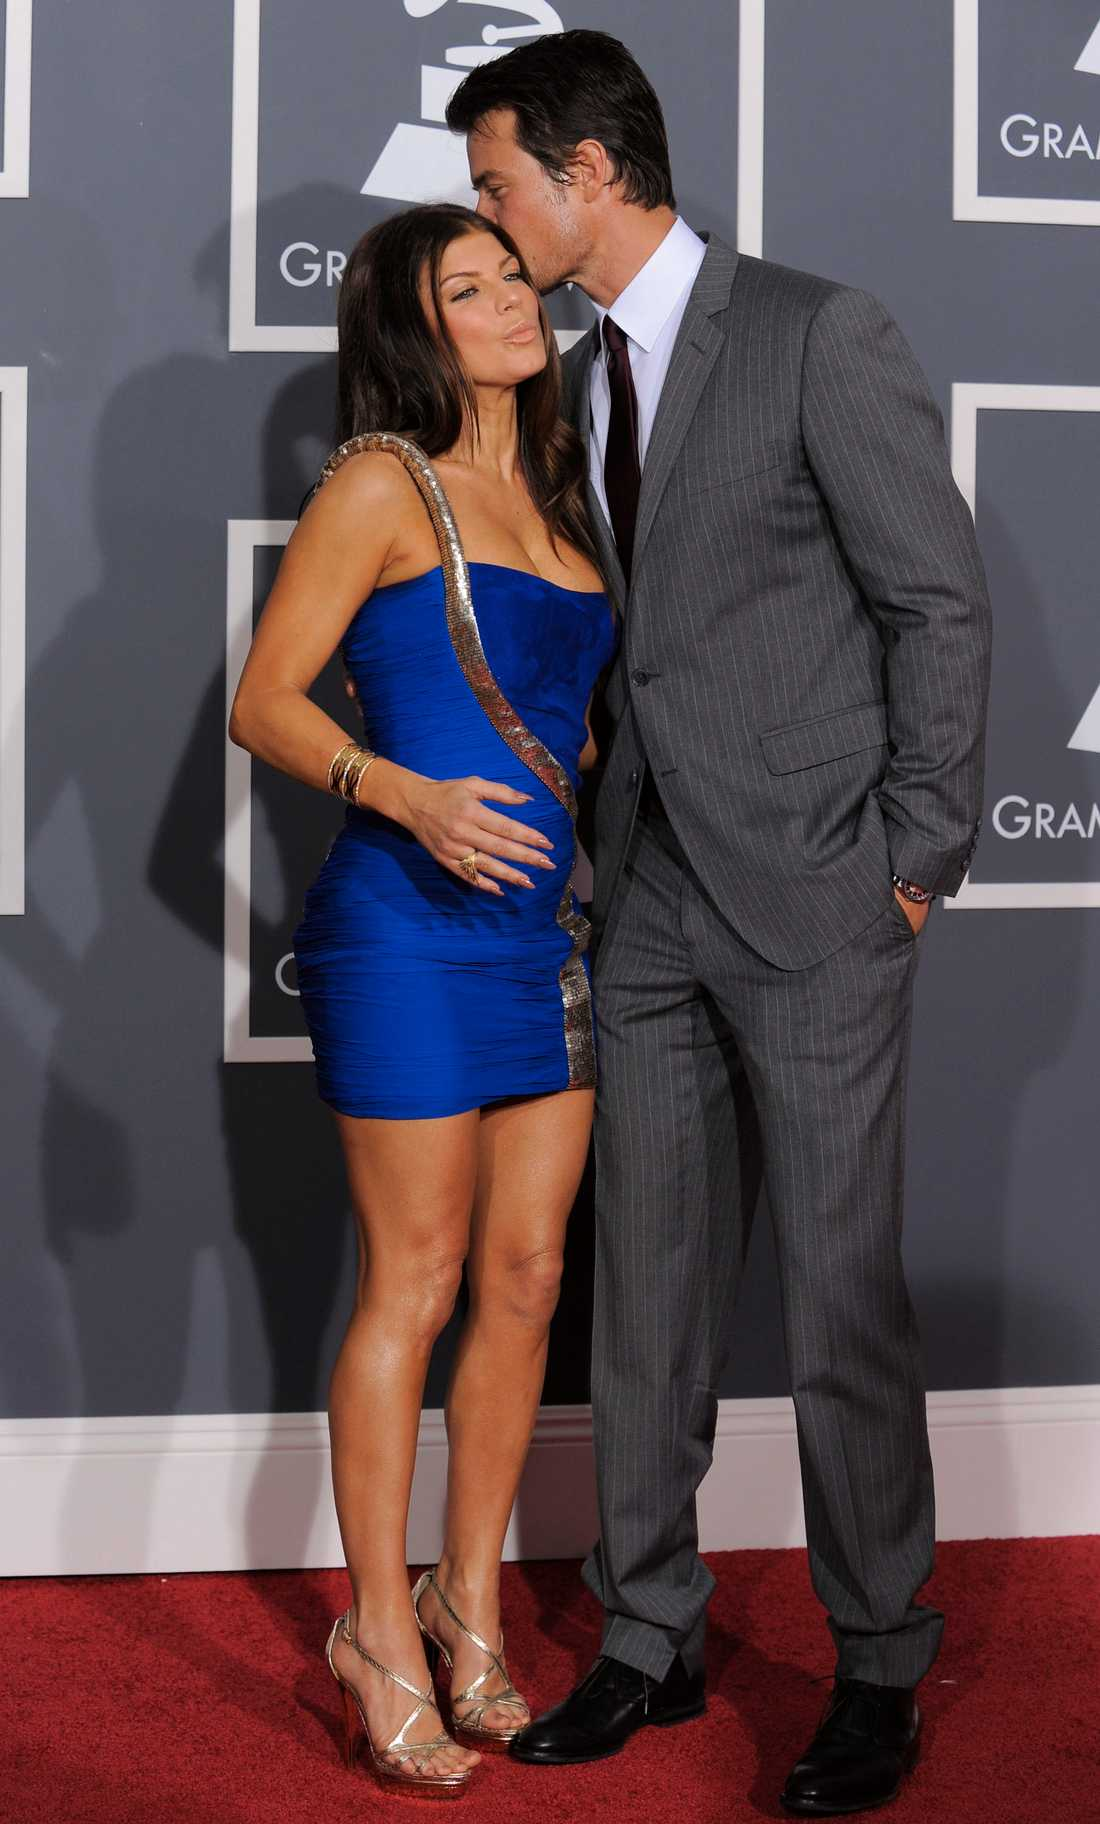 Paret gifte sig i Malibu 2009.